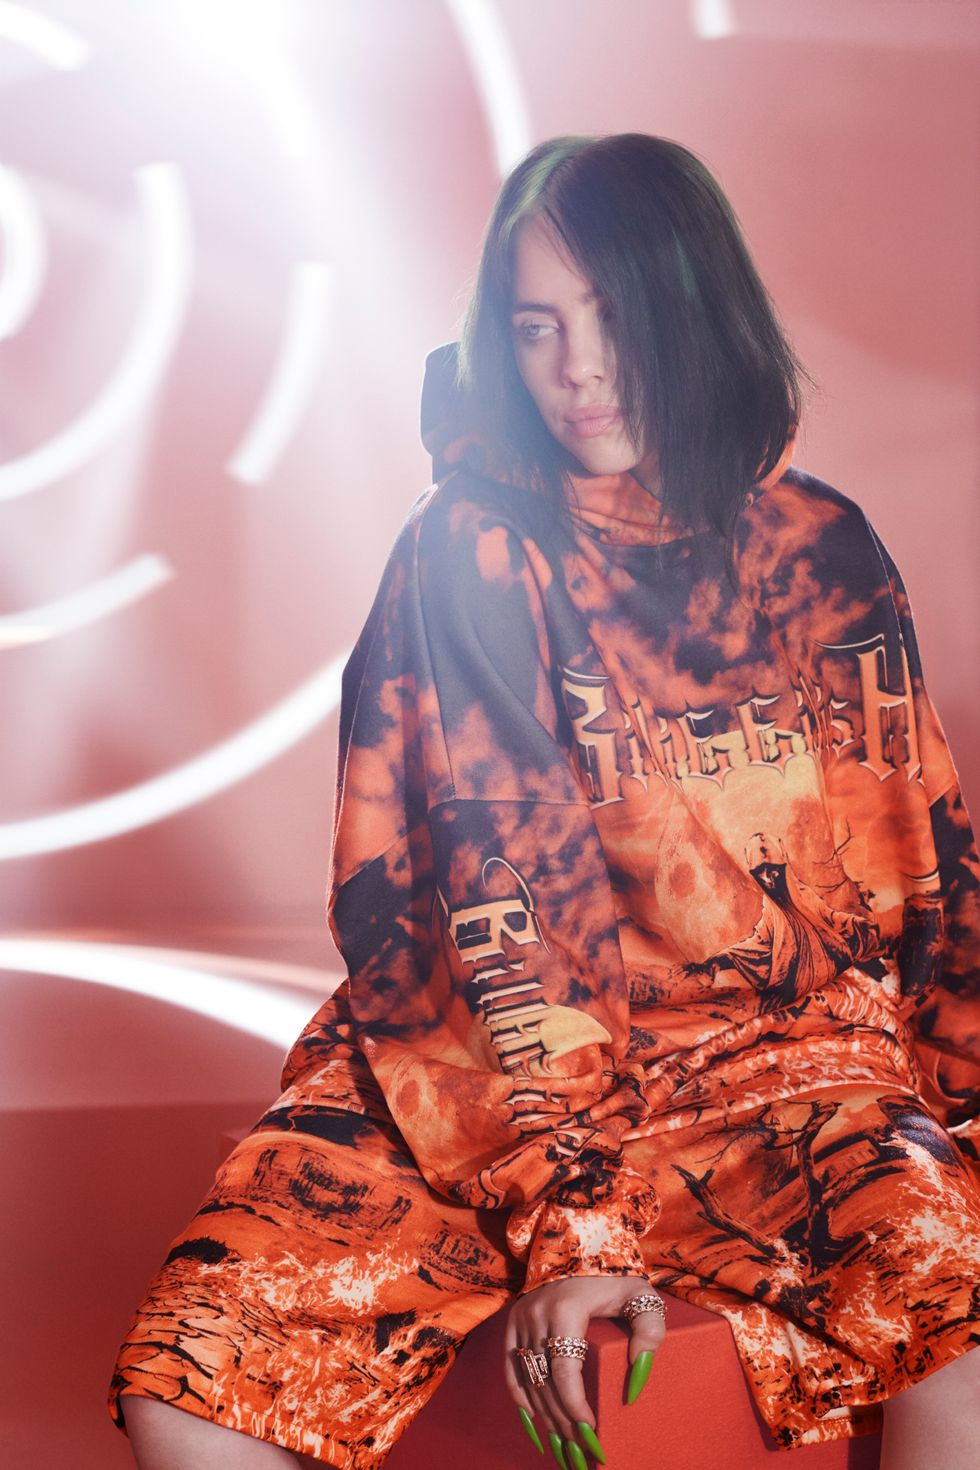 bershka billie eilish coleccion fotos video sudadera pantalon naranja